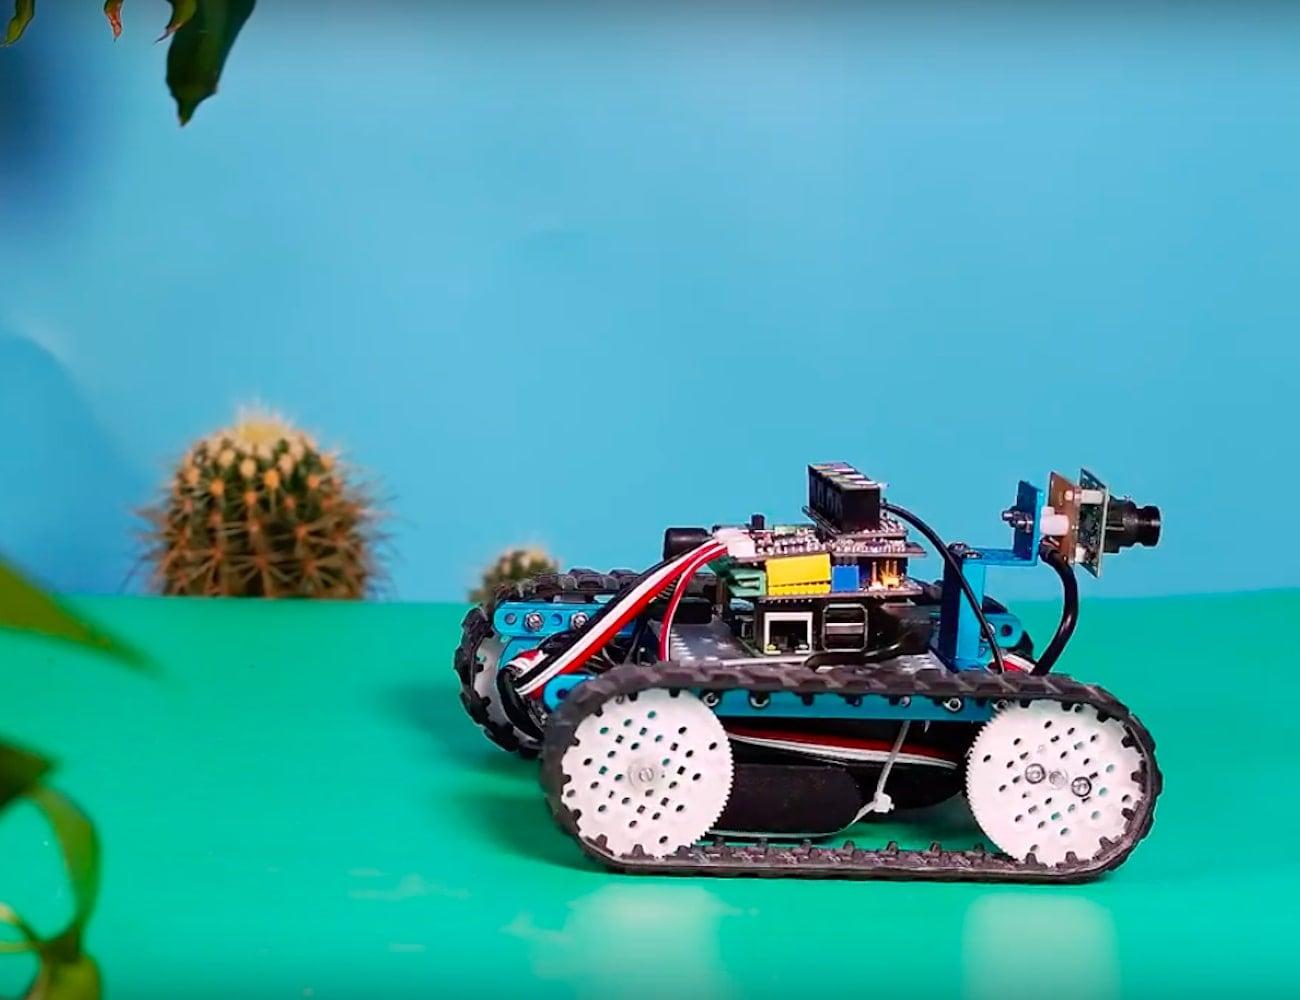 Makeblock Ultimate 2.0 Programmable Robot Kit